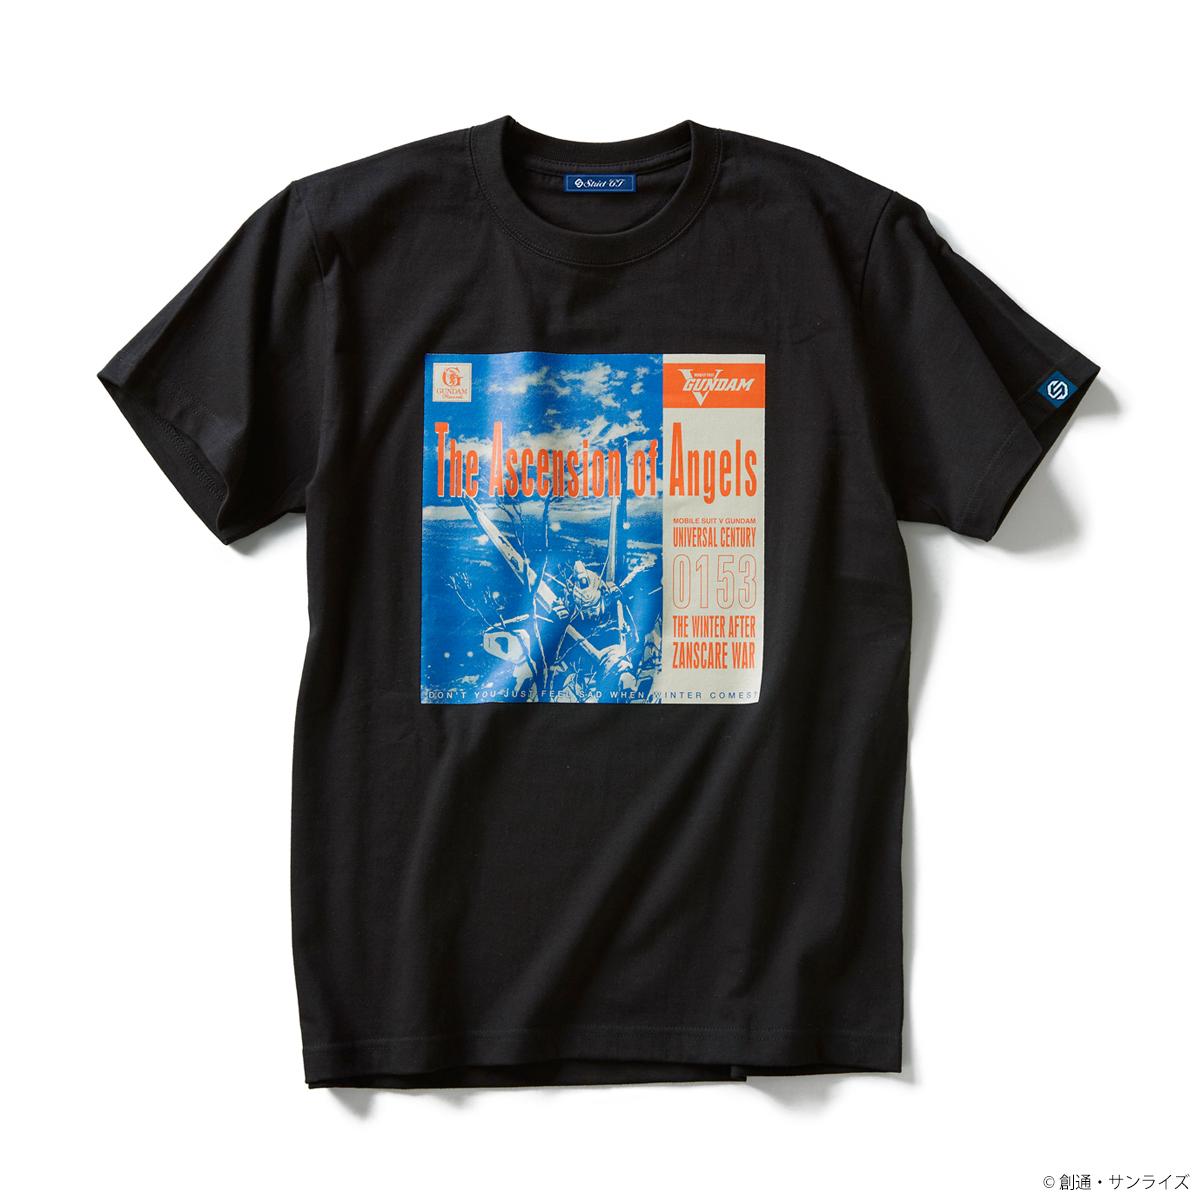 STRICT-G GUNDAM RECORDS 『機動戦士Vガンダム』Tシャツ